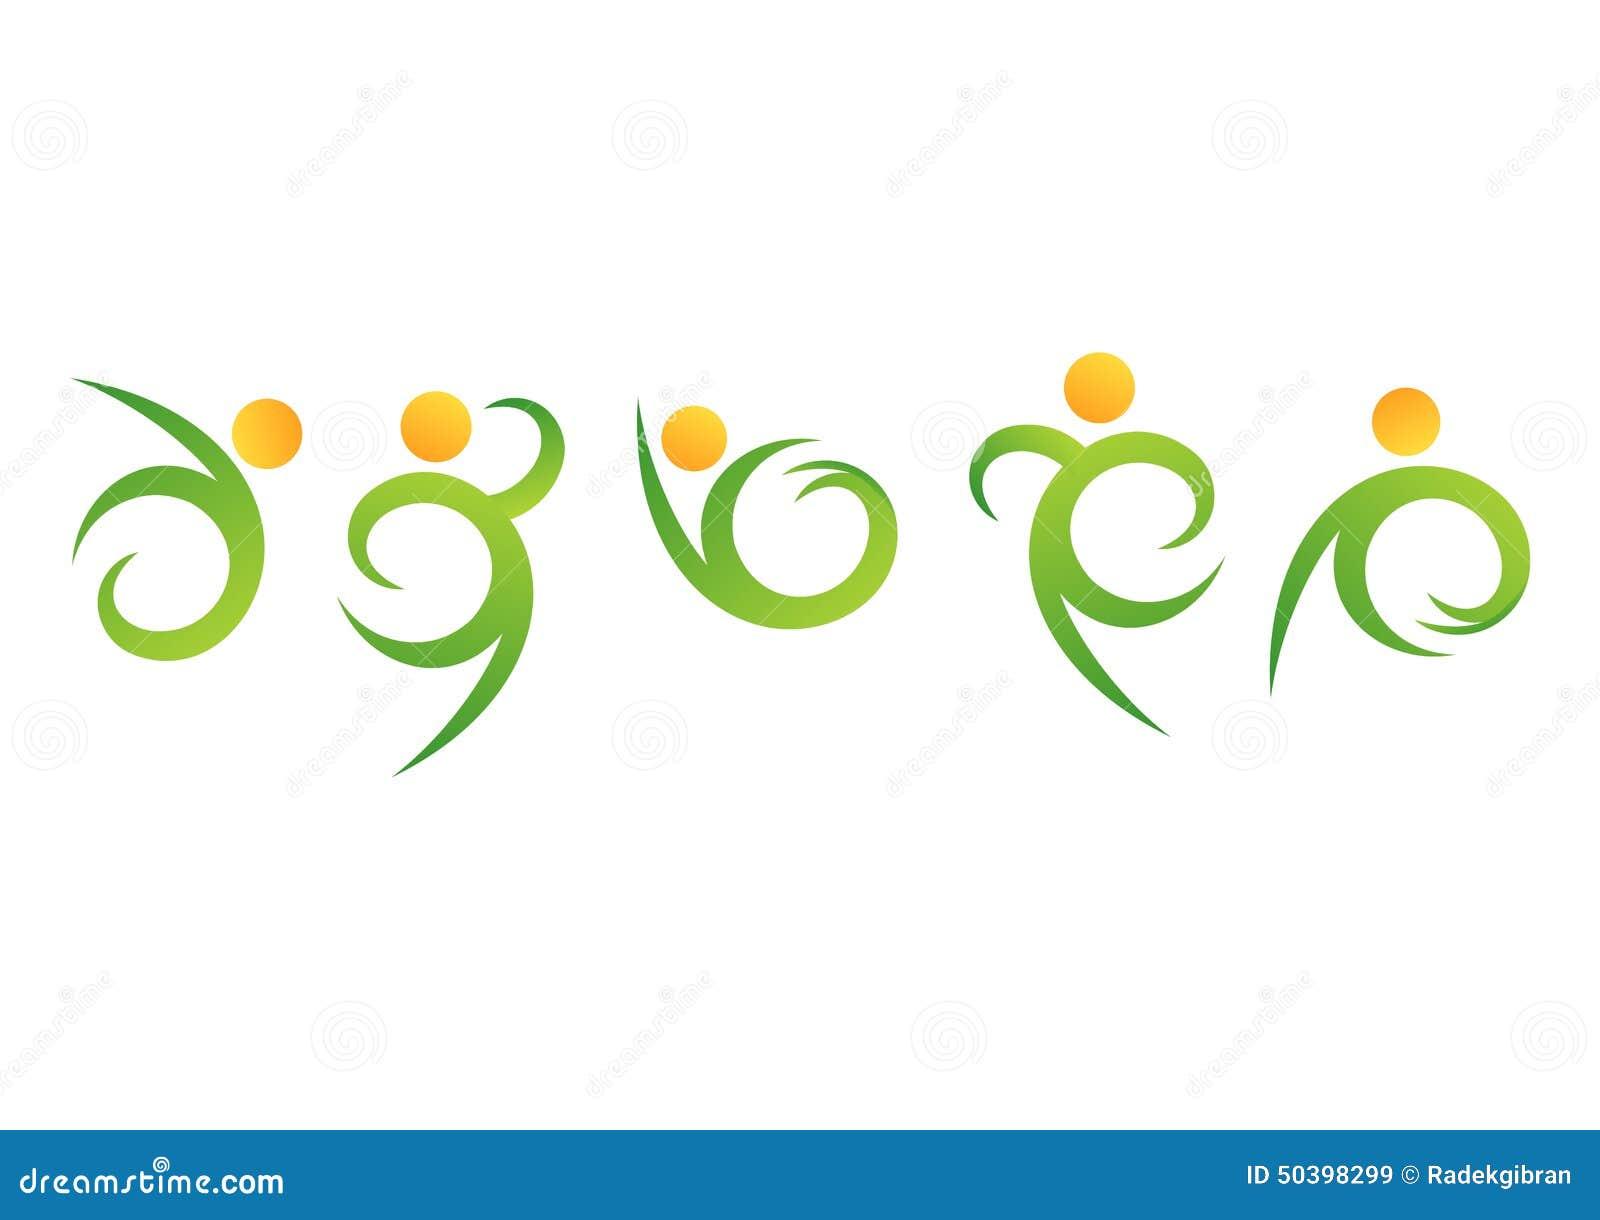 Картинки логотипы люди и природа